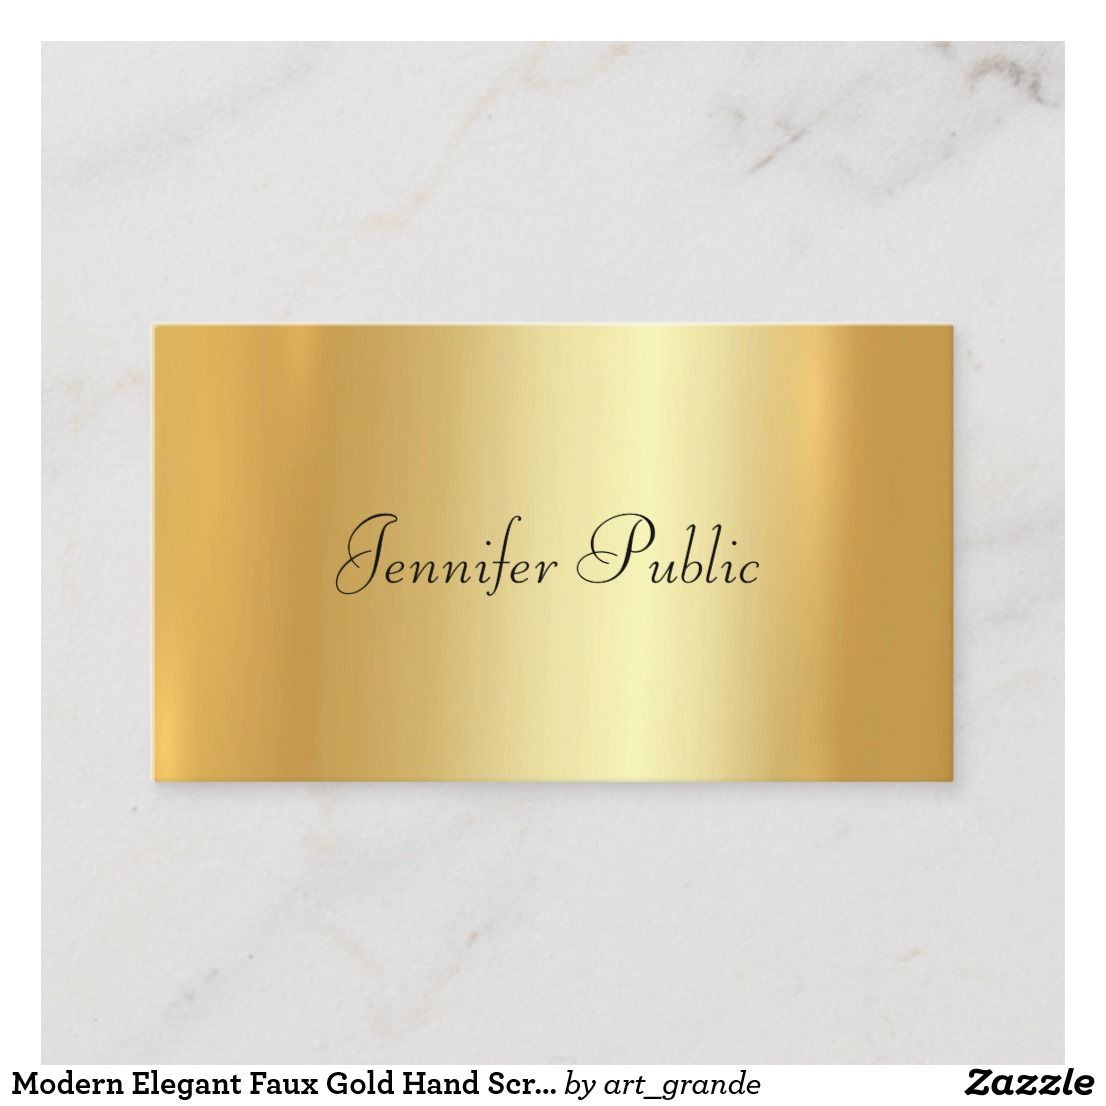 Modern Elegant Faux Gold Hand Script Template Business Card